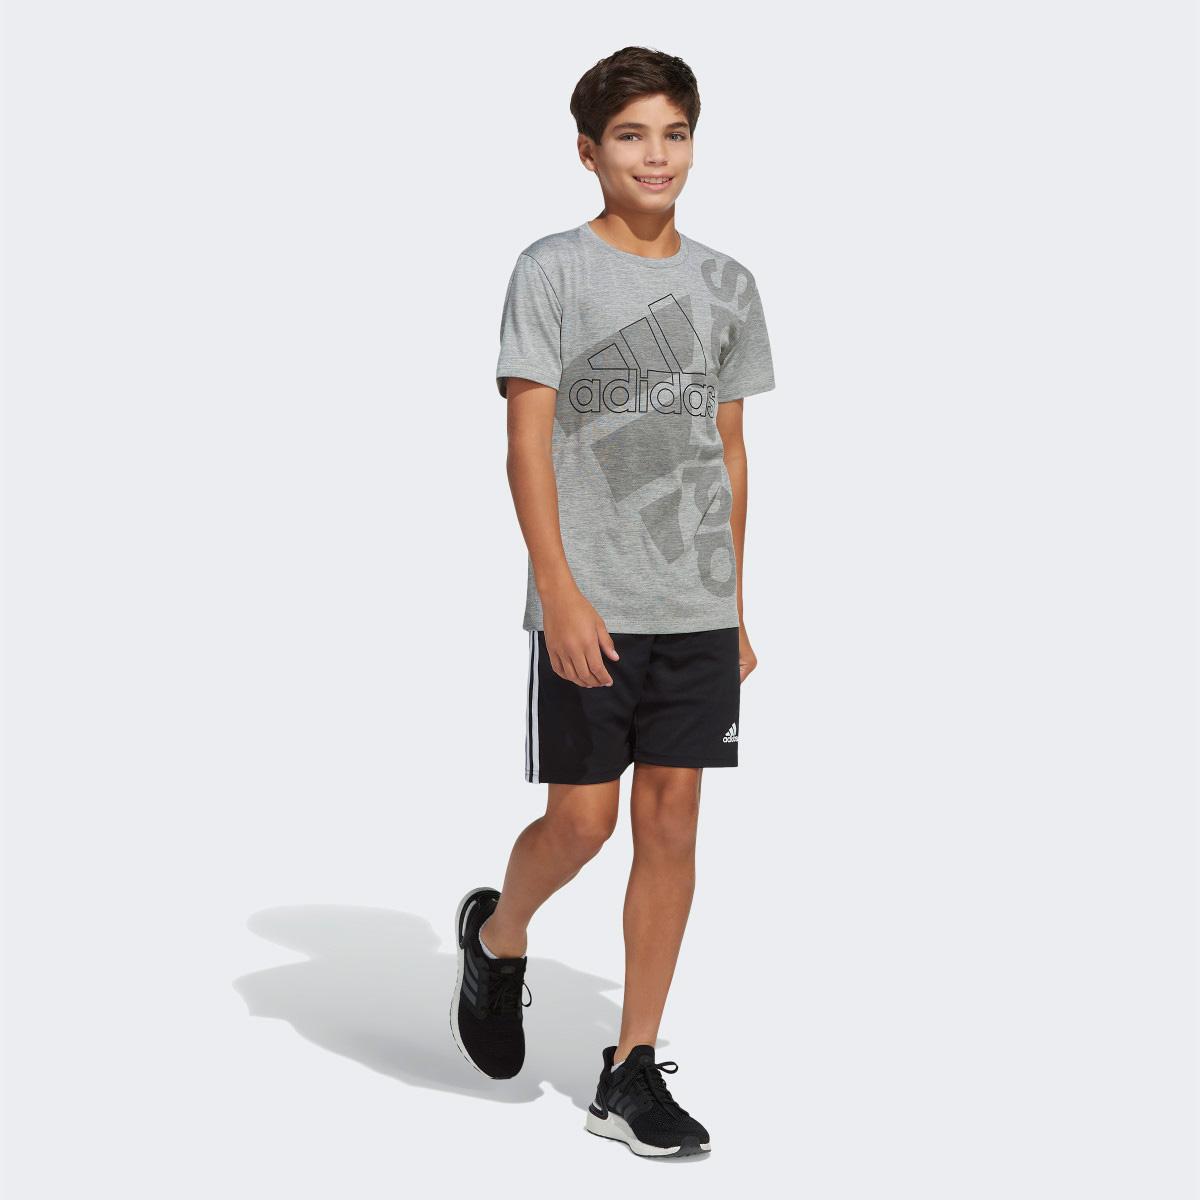 Boys' Short Sleeve AEROREADY Vertical Badge Of Sport Pigment Tee, Heather Gray, swatch